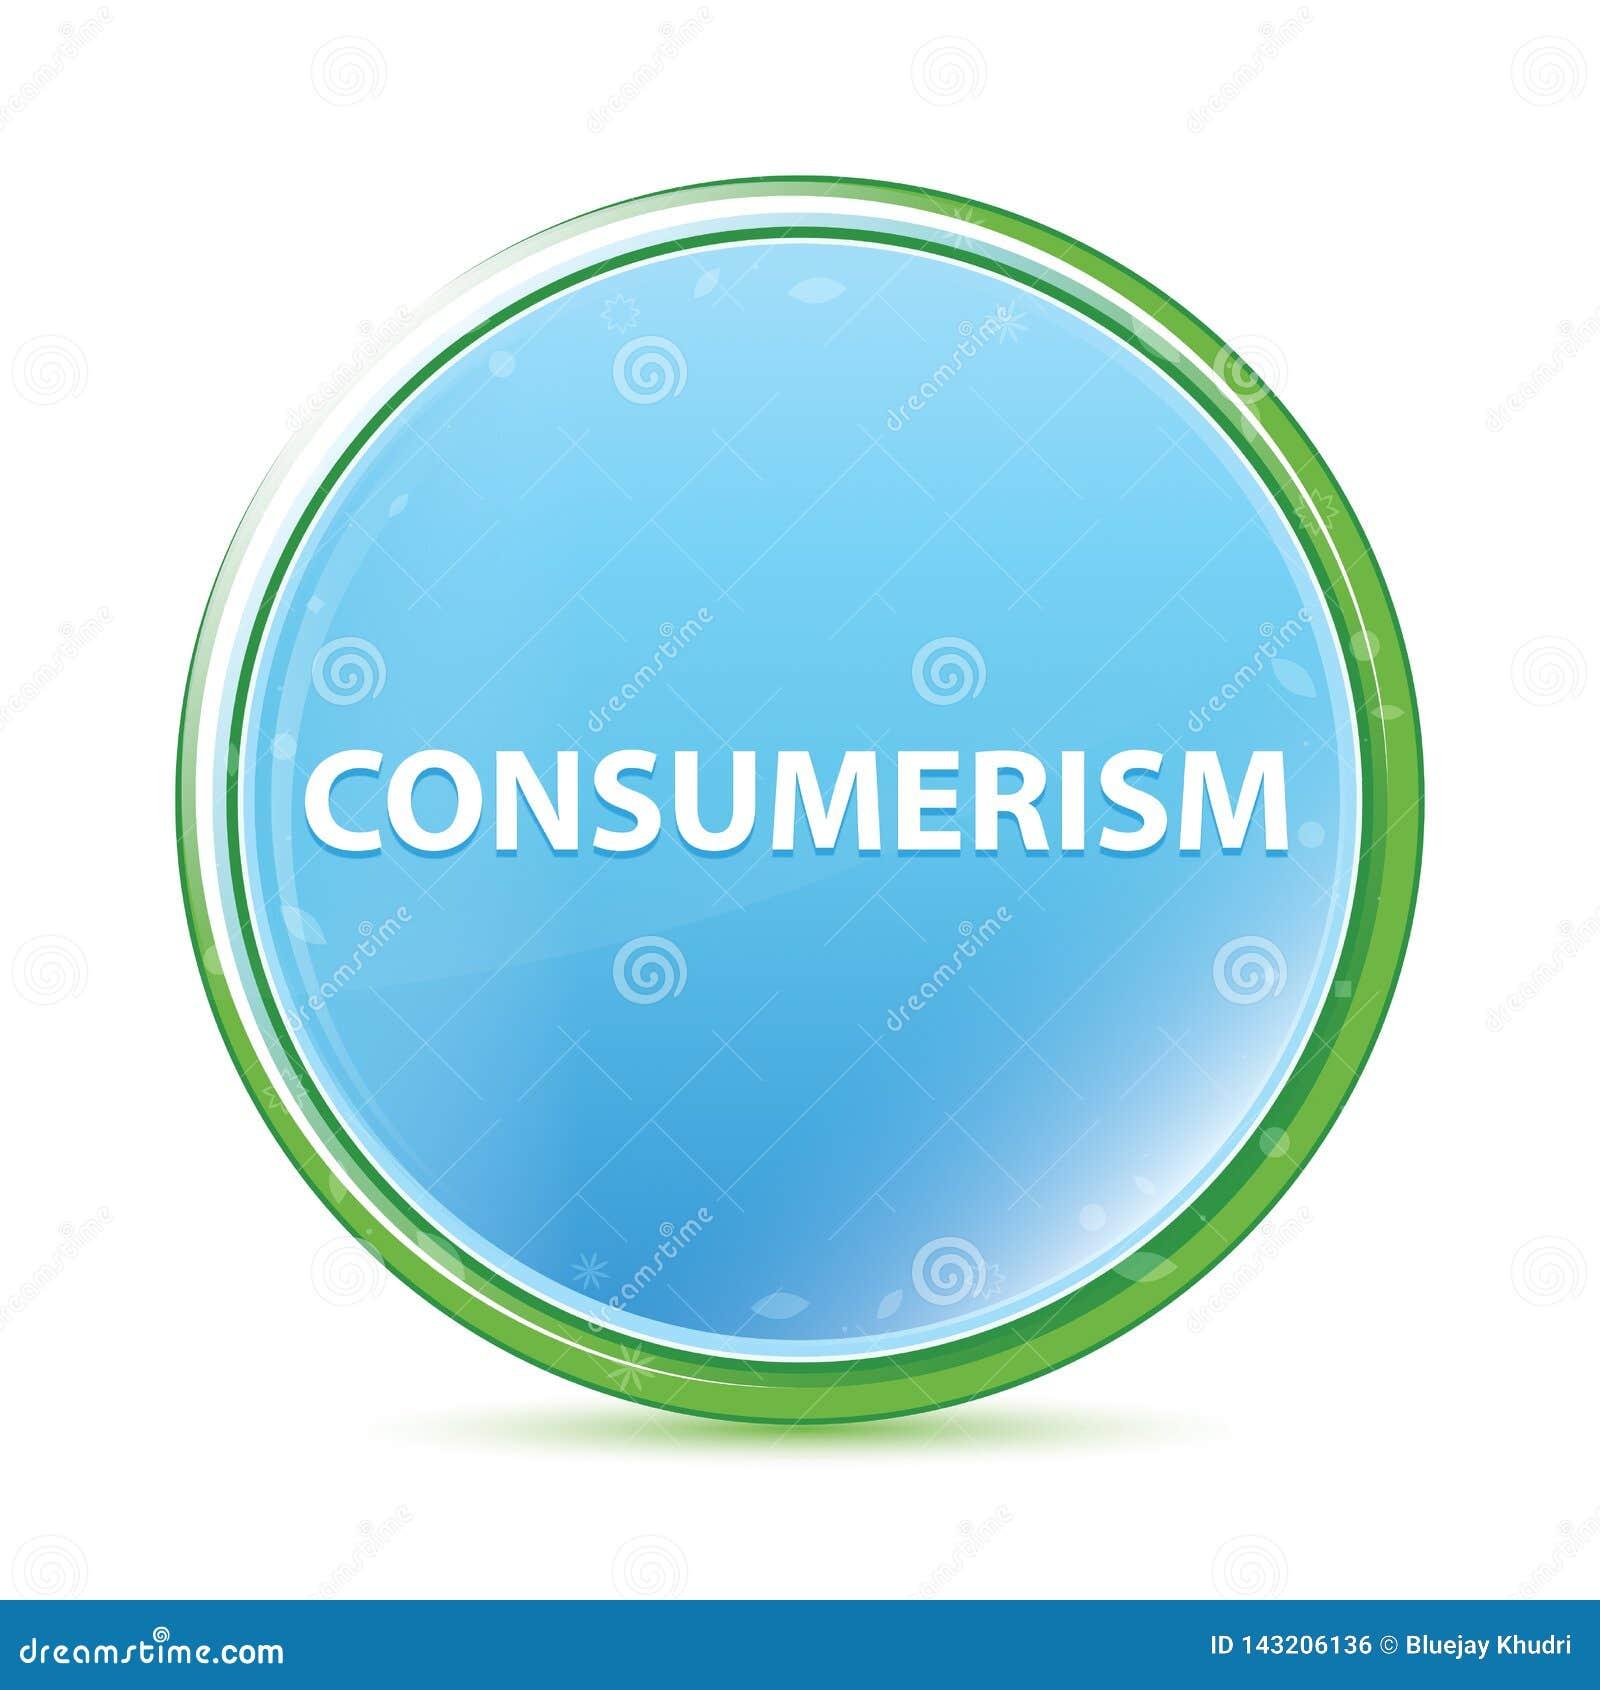 Consumerism natural aqua cyan blue round button